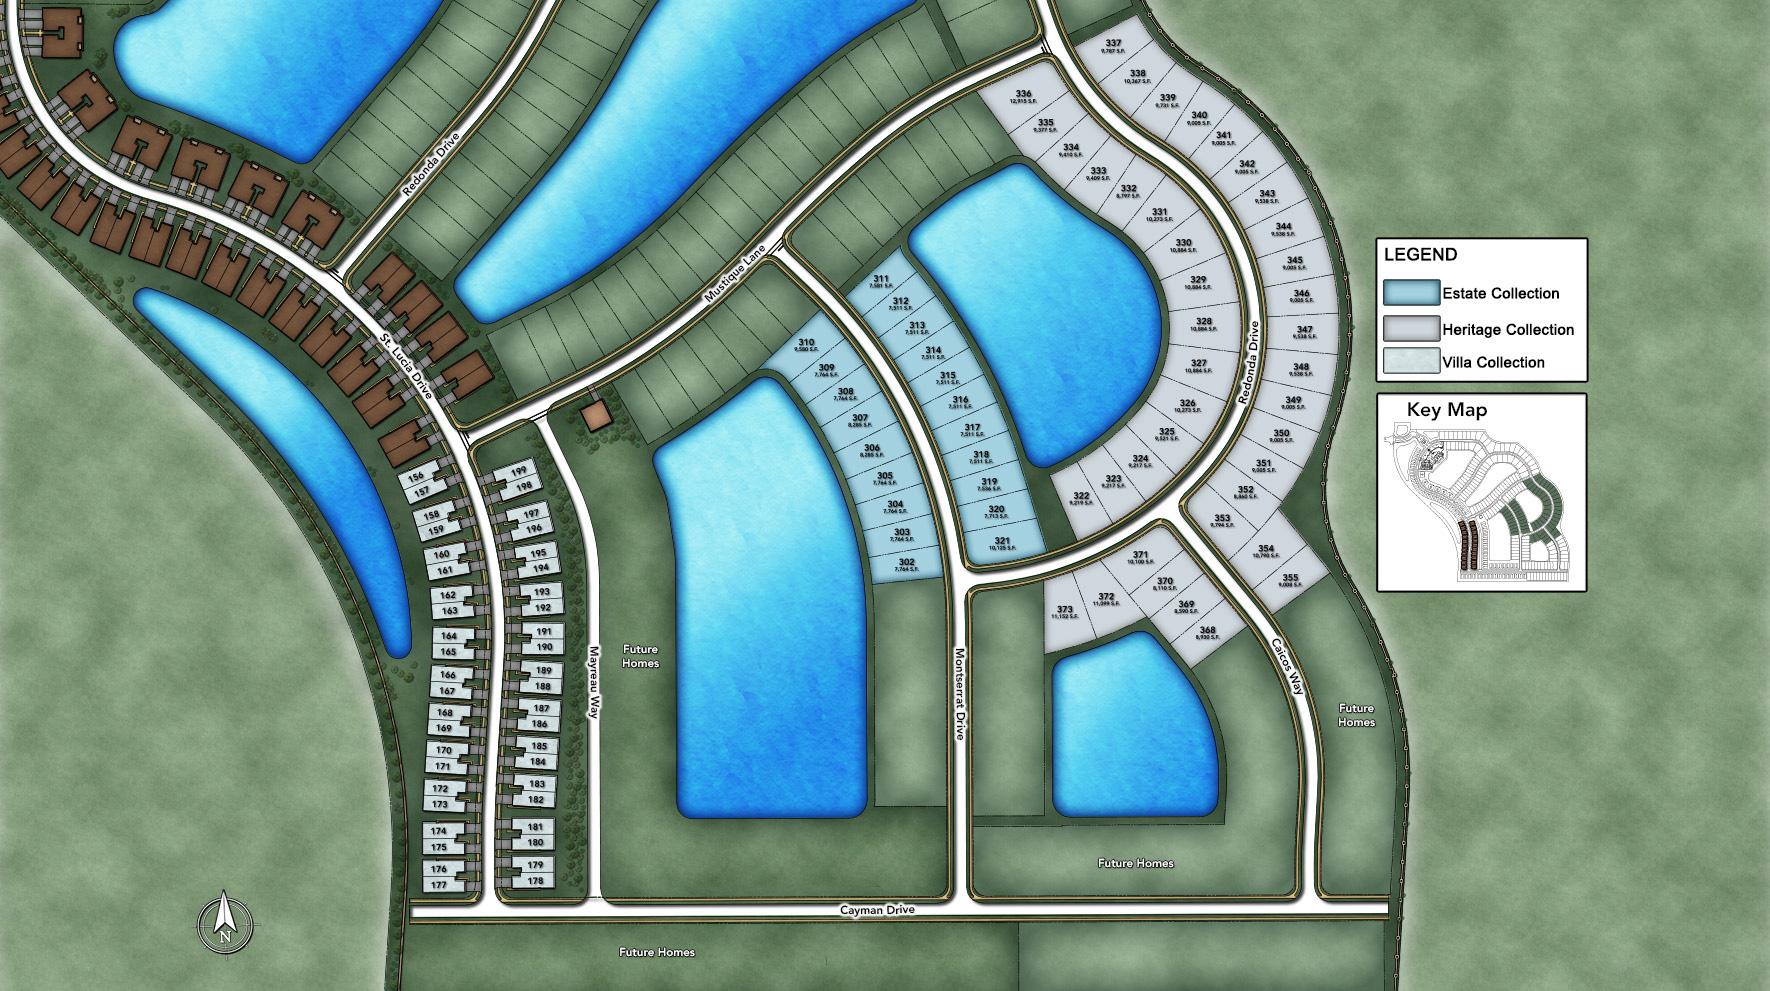 Azure at Hacienda Lakes - Heritage Collection Site Plan II